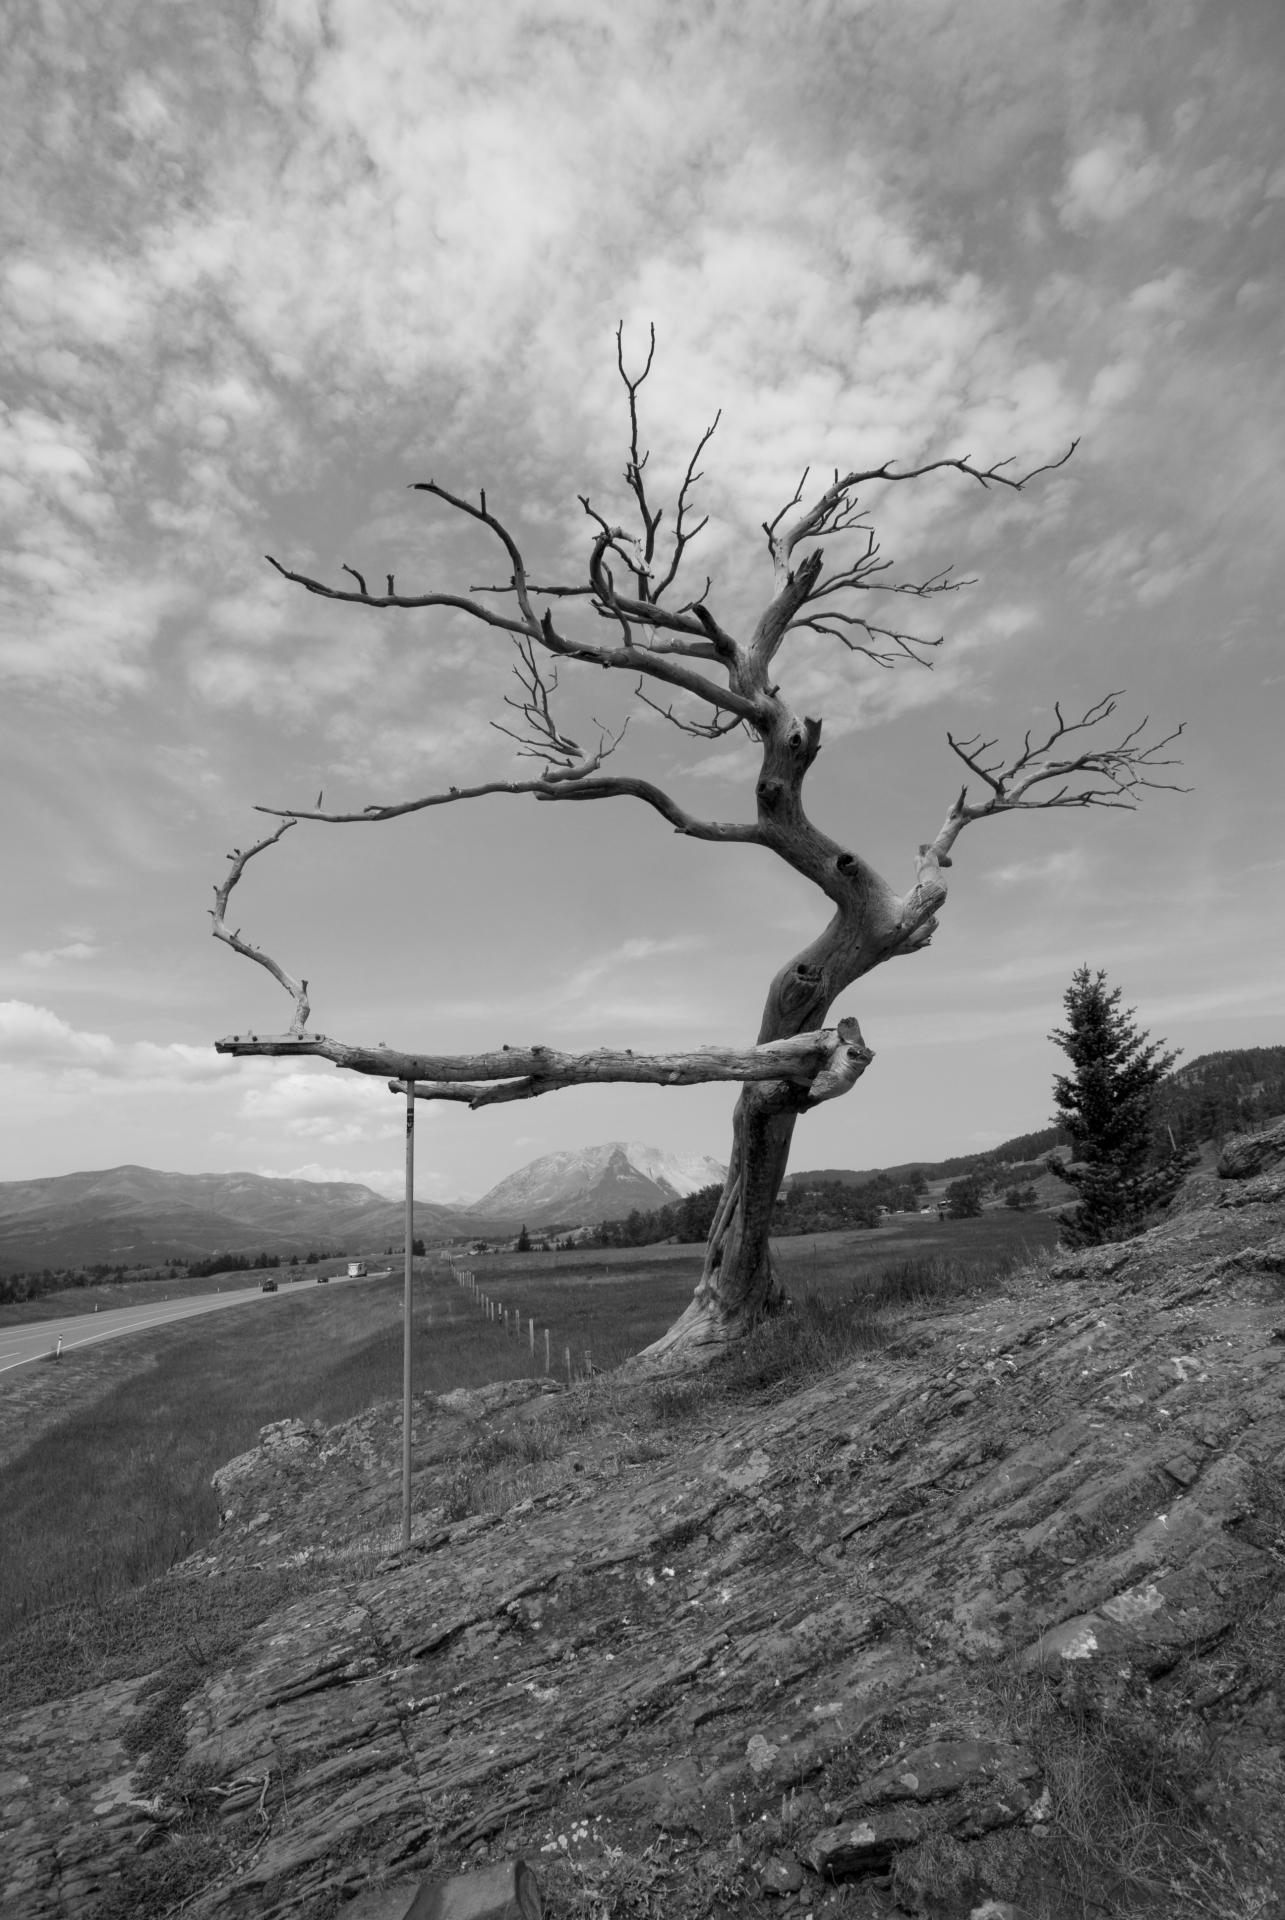 The Burmis Tree